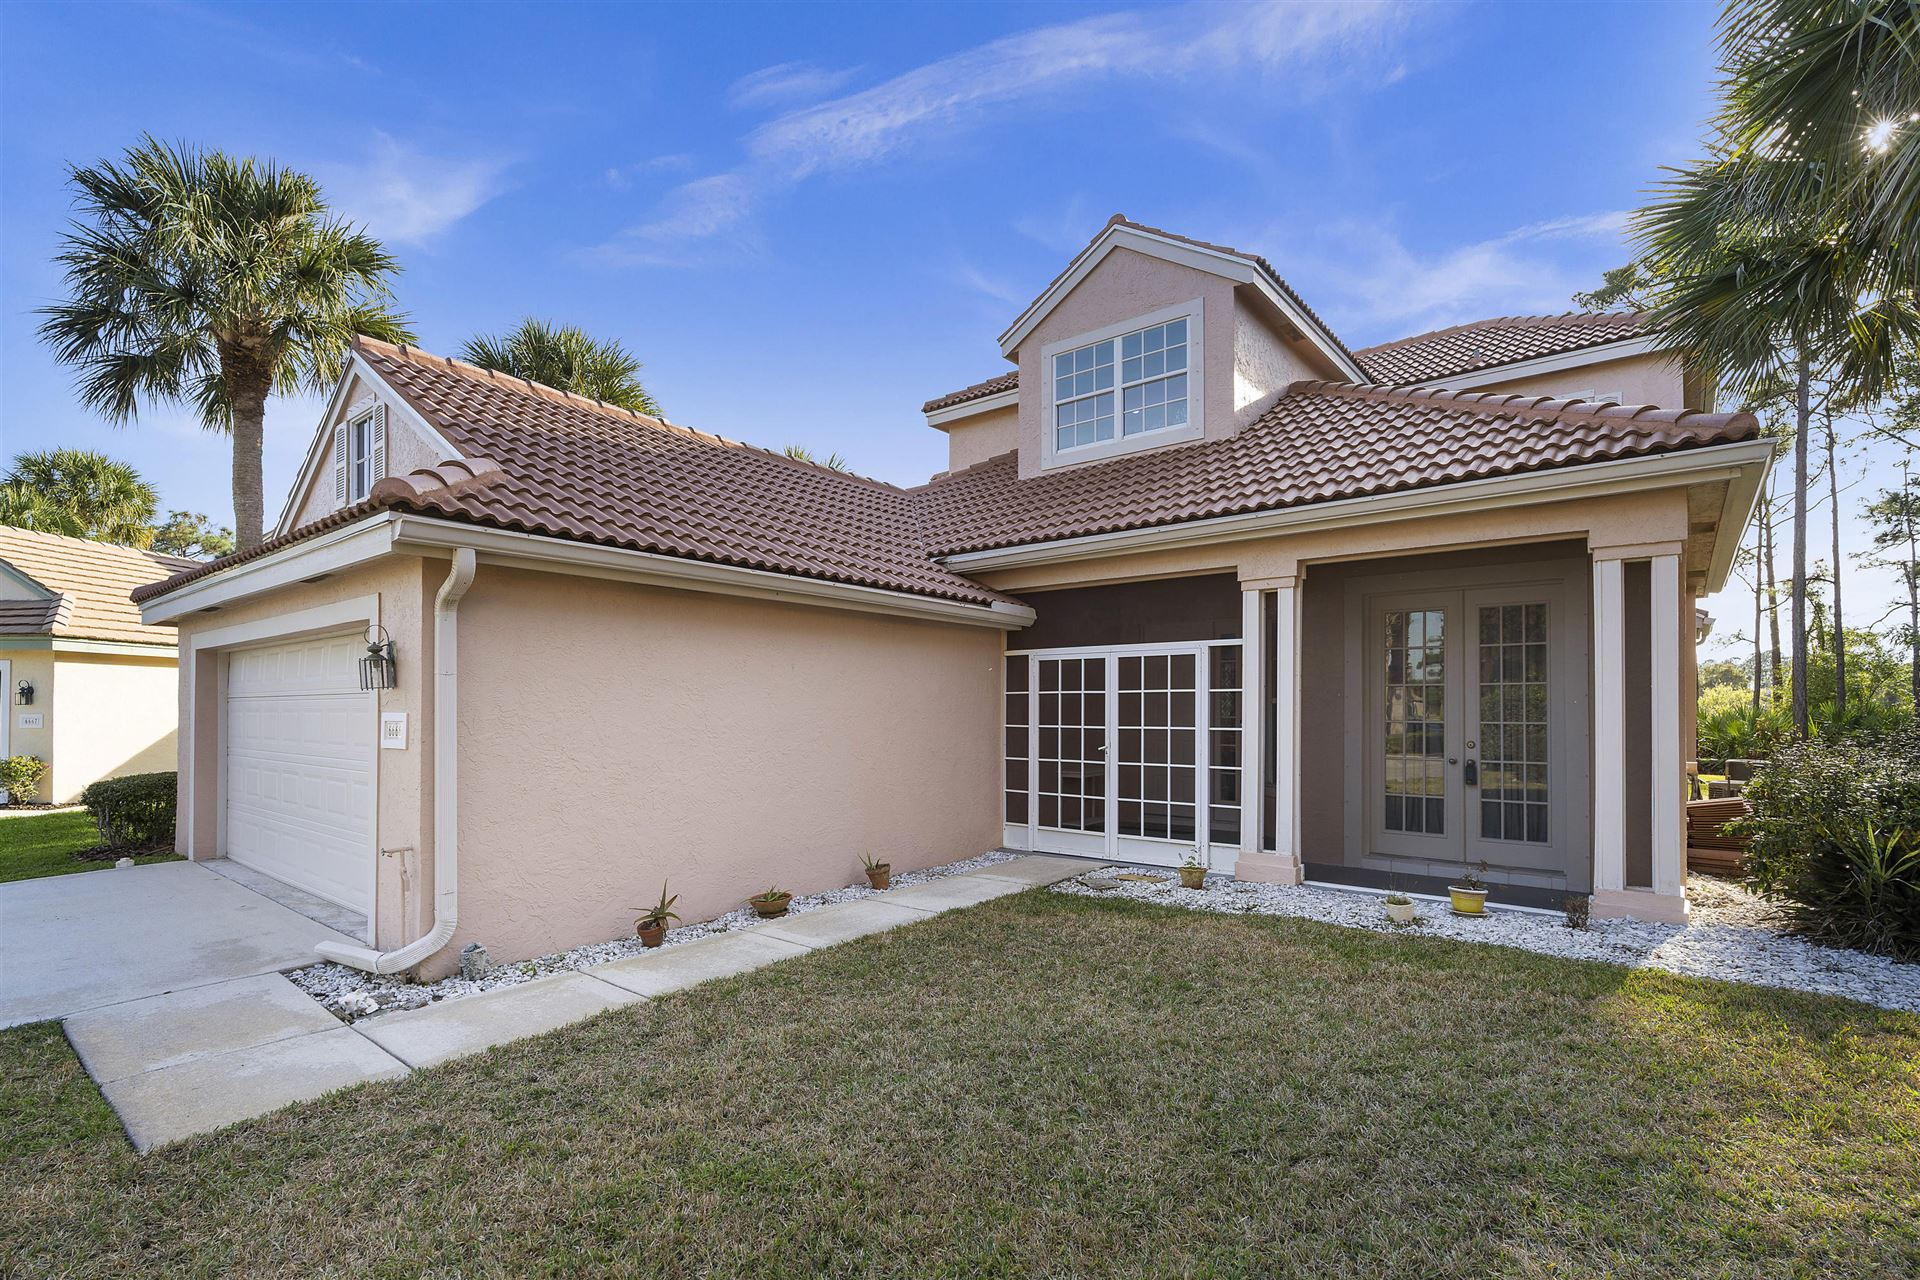 Photo of 6666 SE Seven Oaks Lane, Stuart, FL 34997 (MLS # RX-10685644)